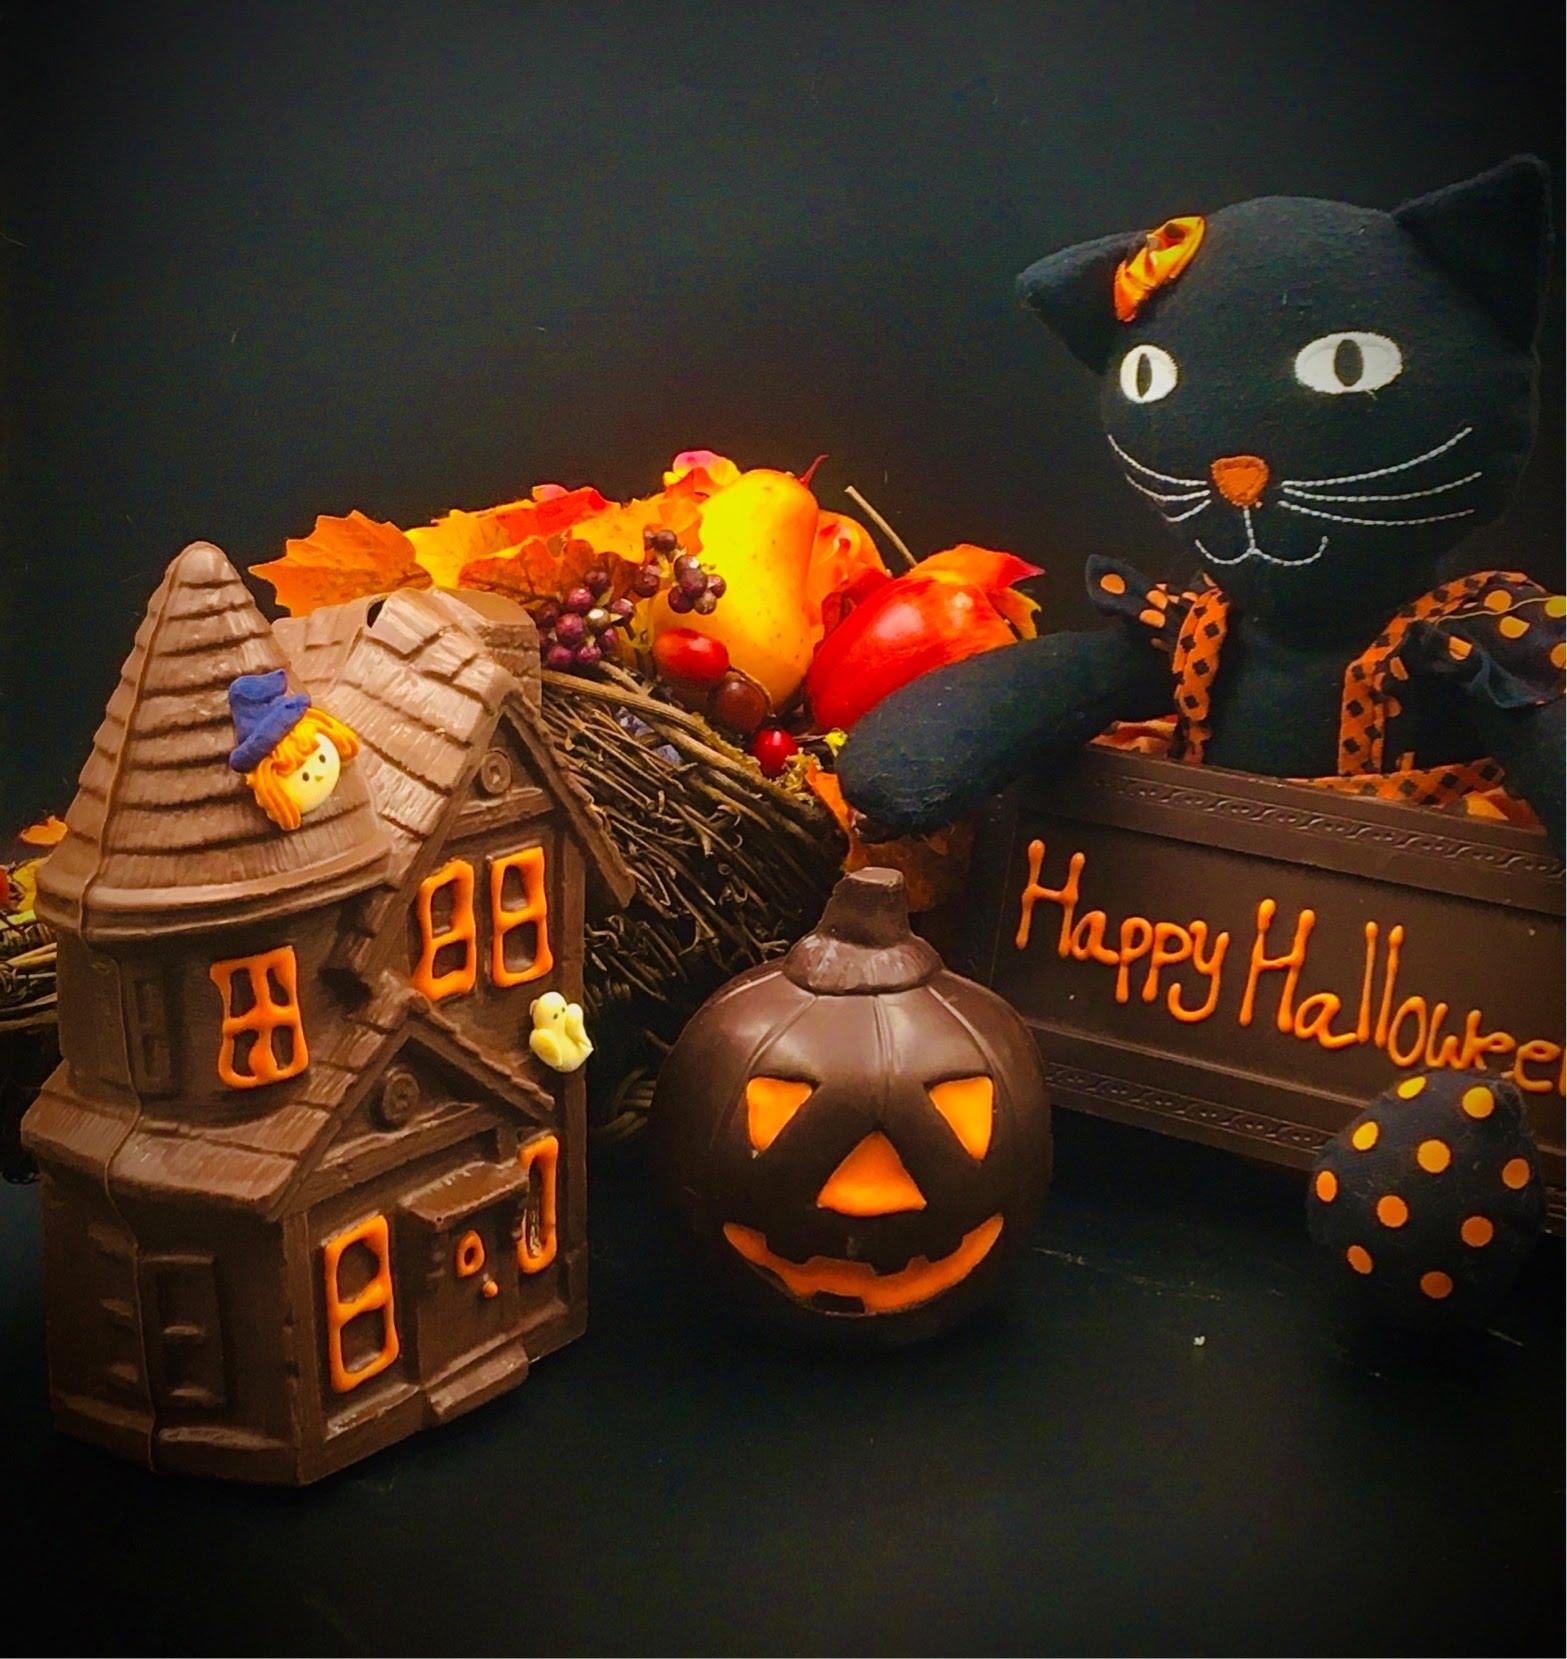 2020 Halloween Hillsborough County Florida Halloween candy still hitting shelves early, despite pandemic